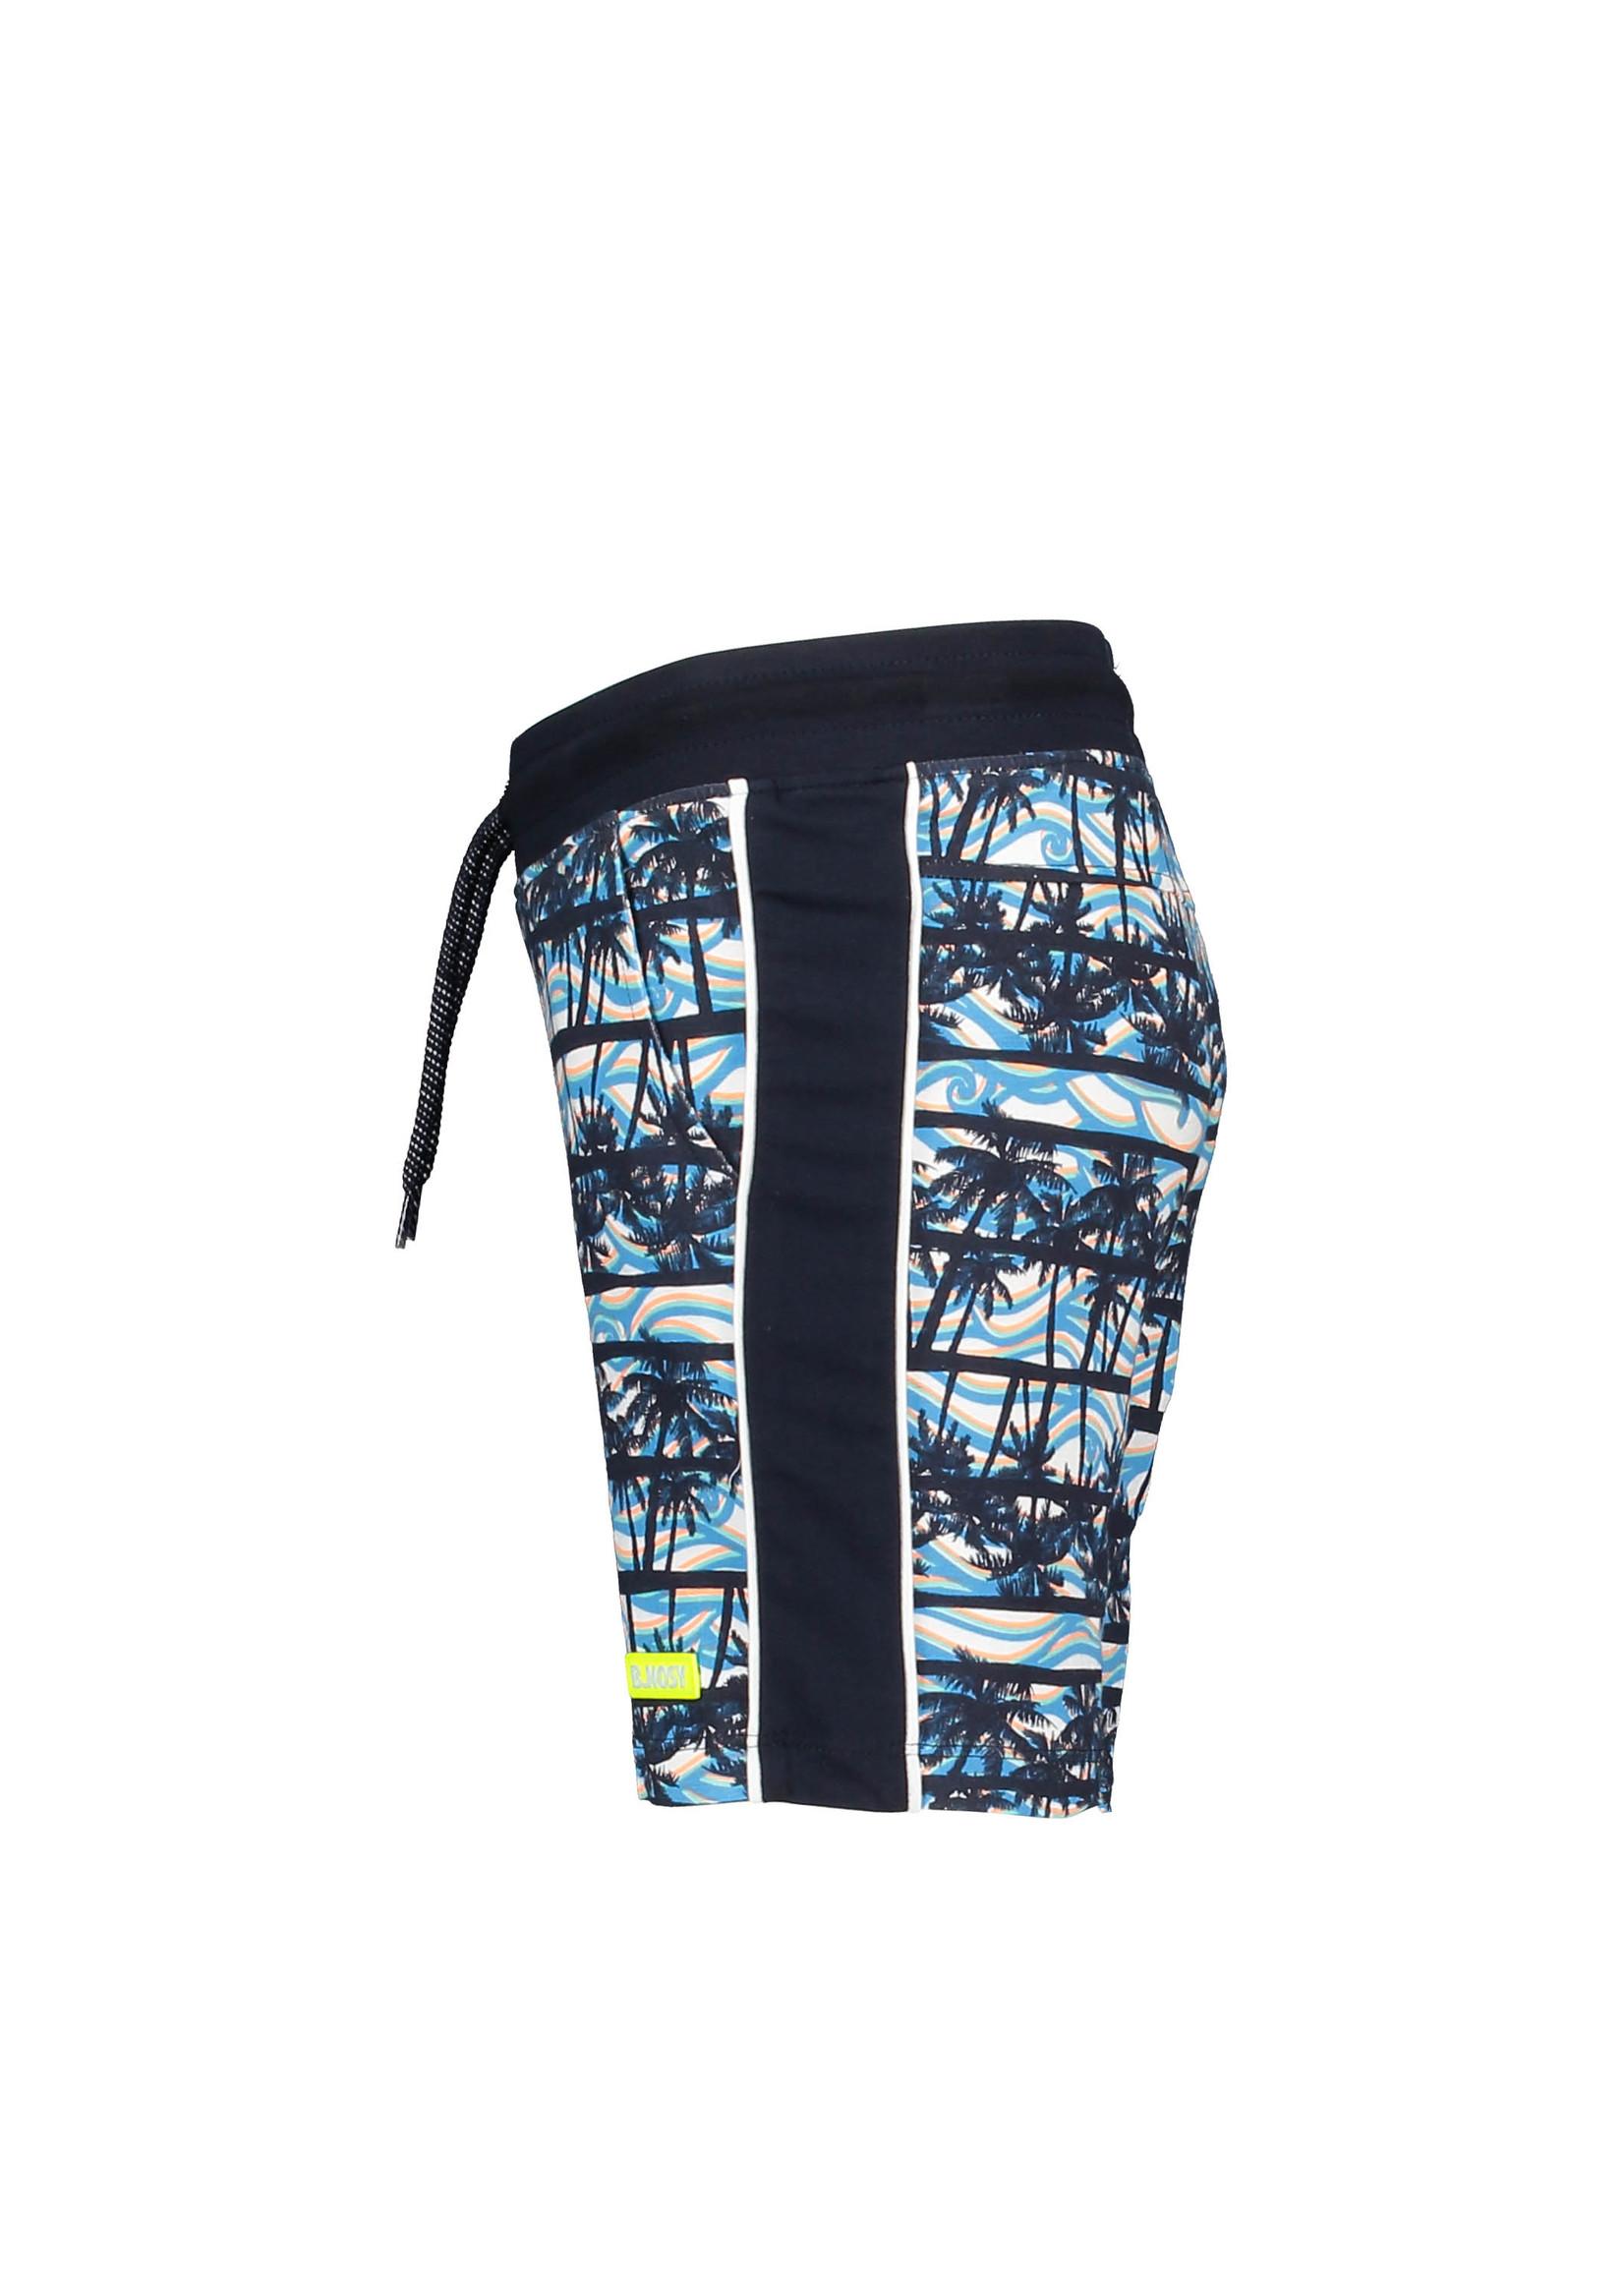 B.nosy Shorts On The Beach Ao